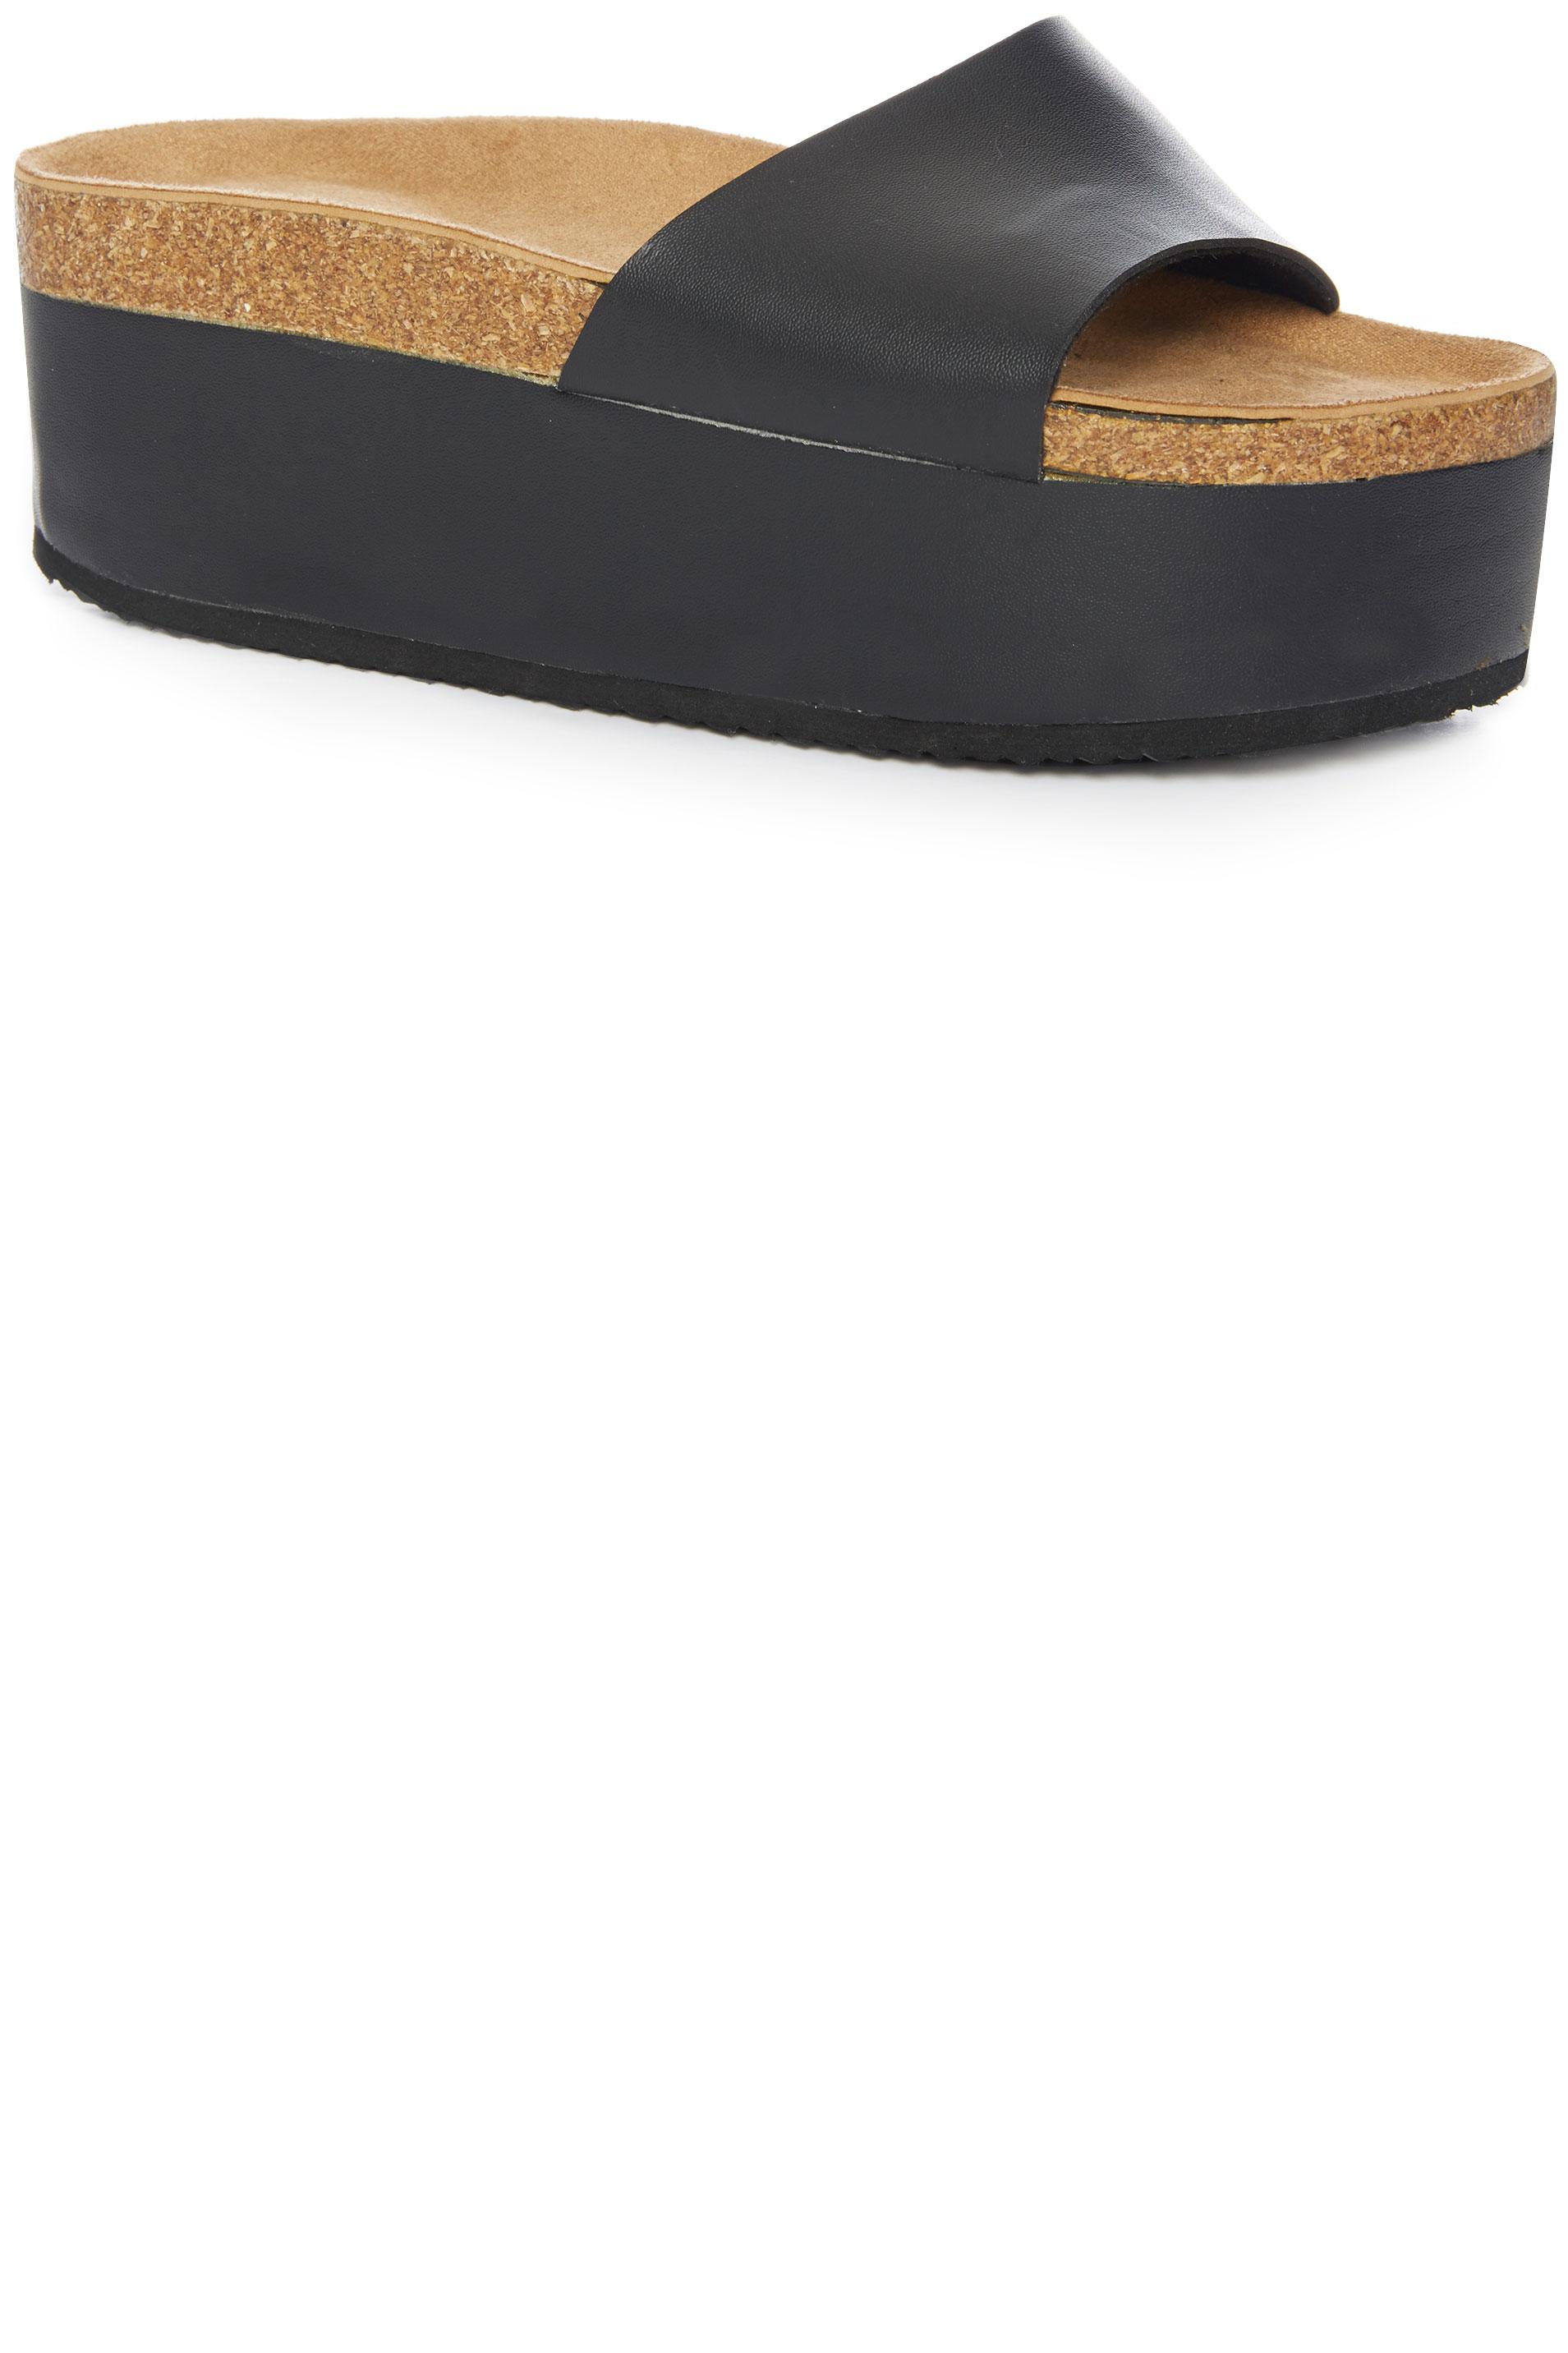 Black sandals primark - Black Sandals Primark 34